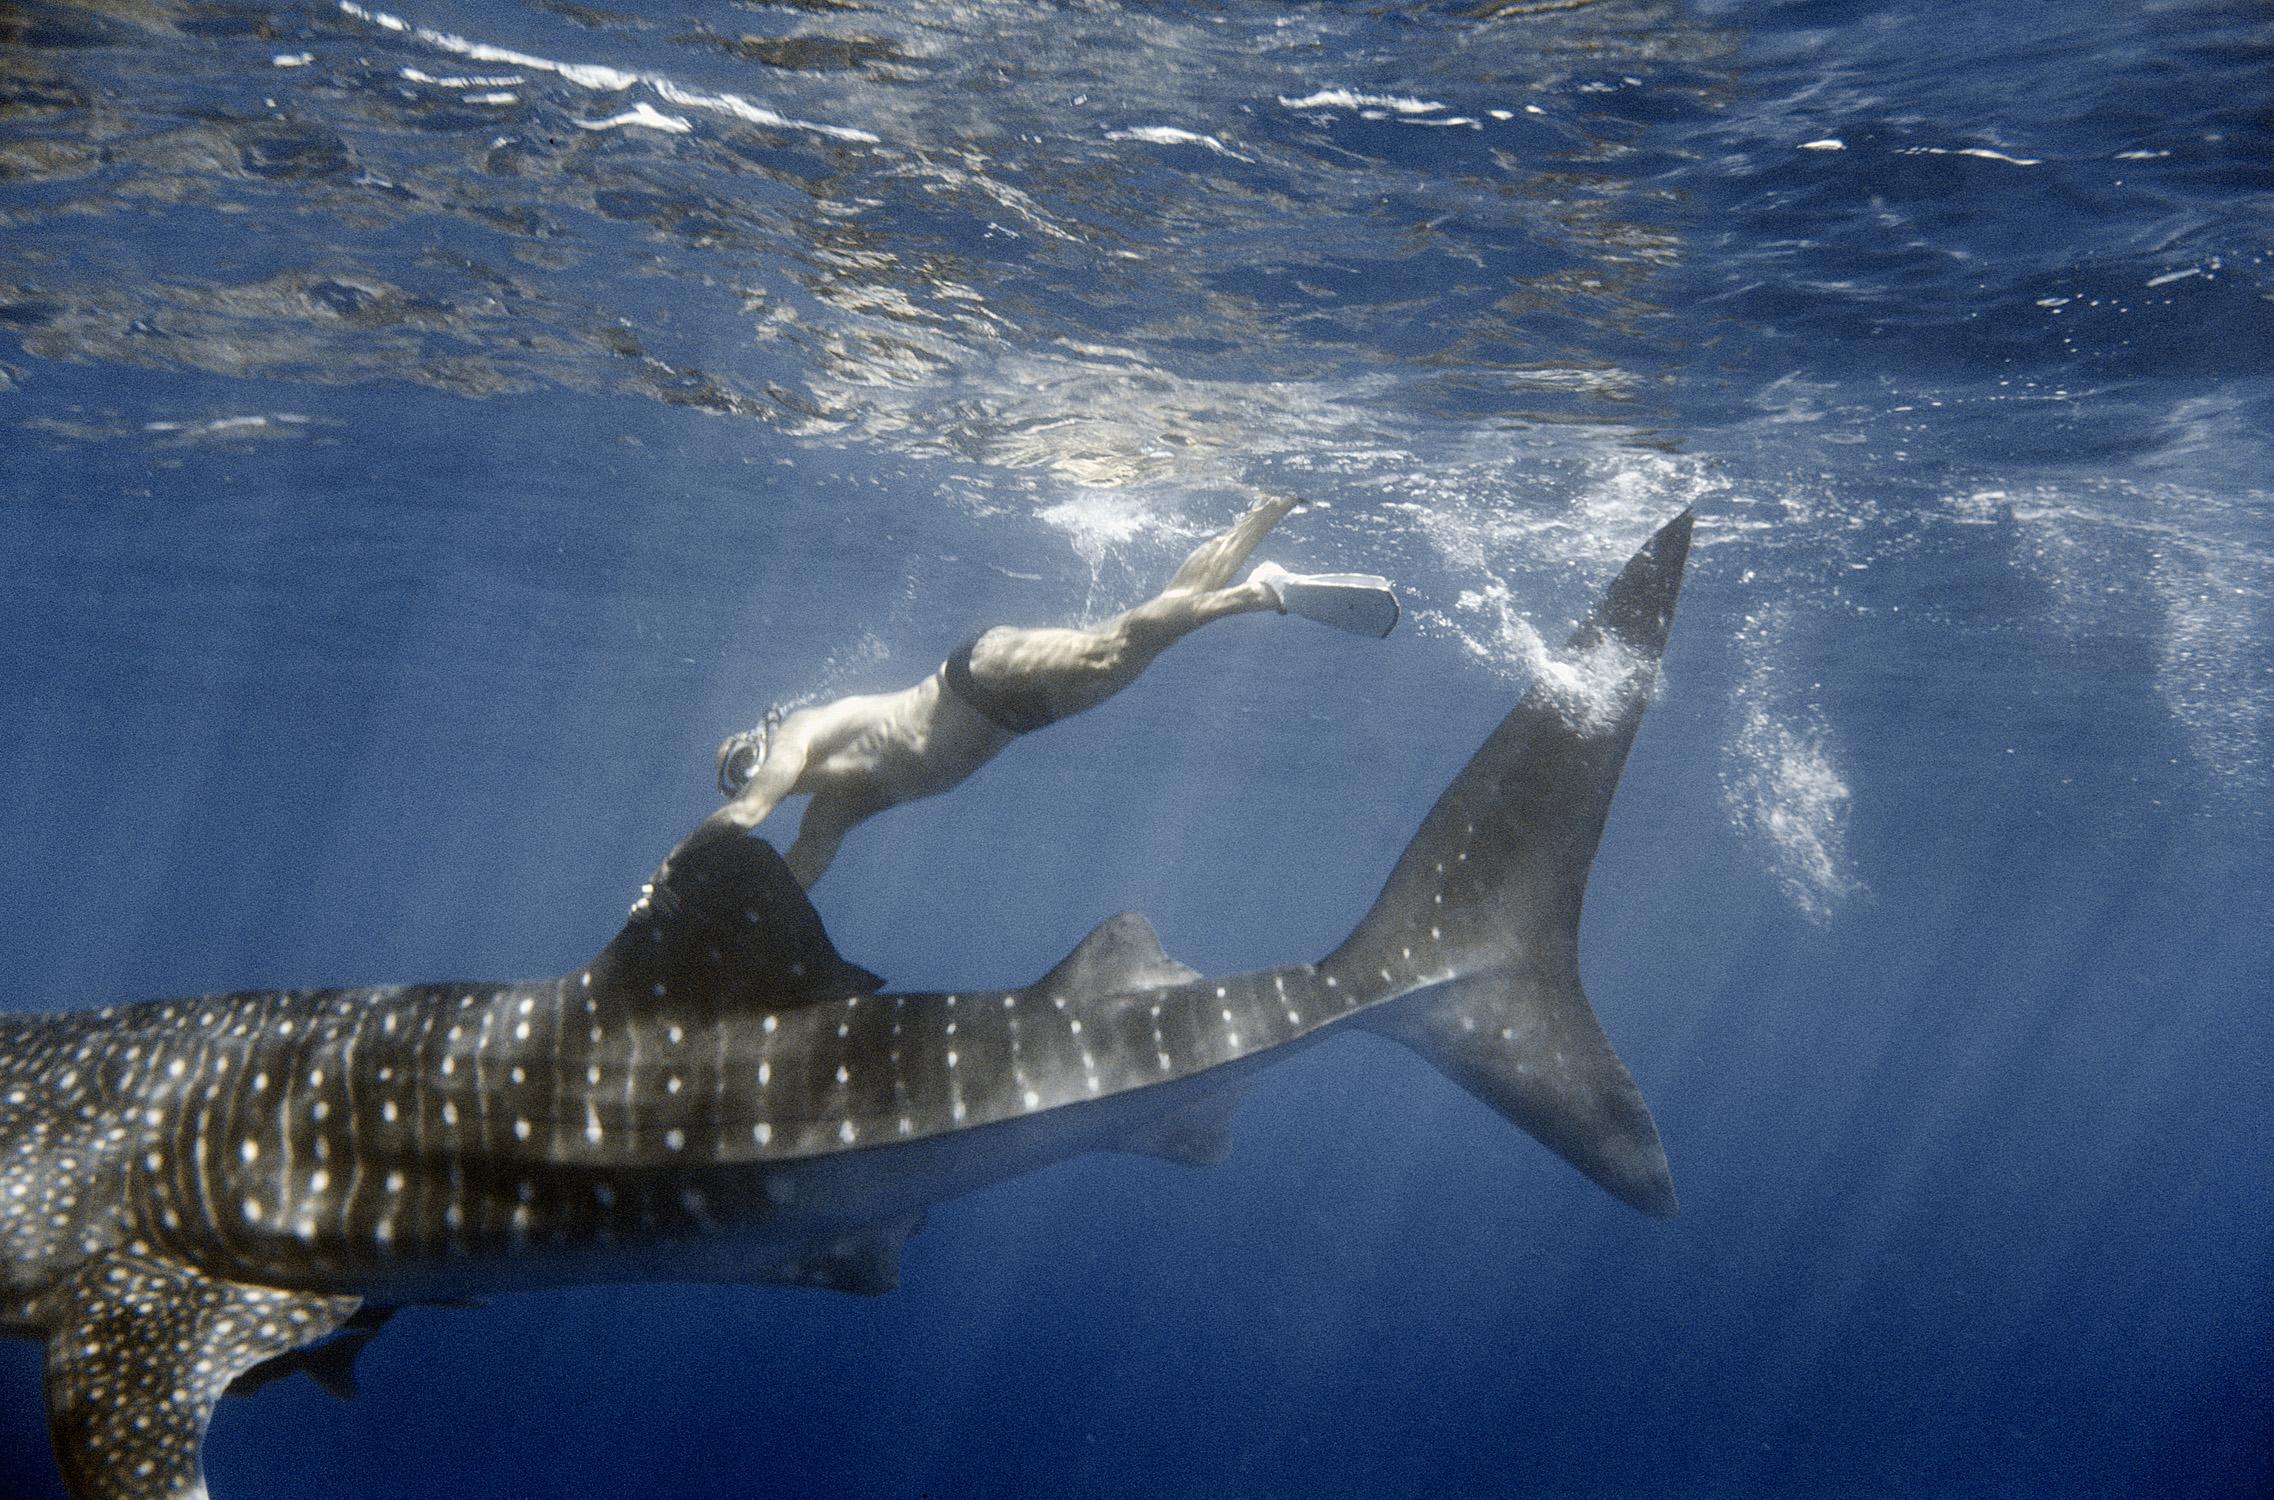 Steve Borowski hitches a ride on a Whale Shark